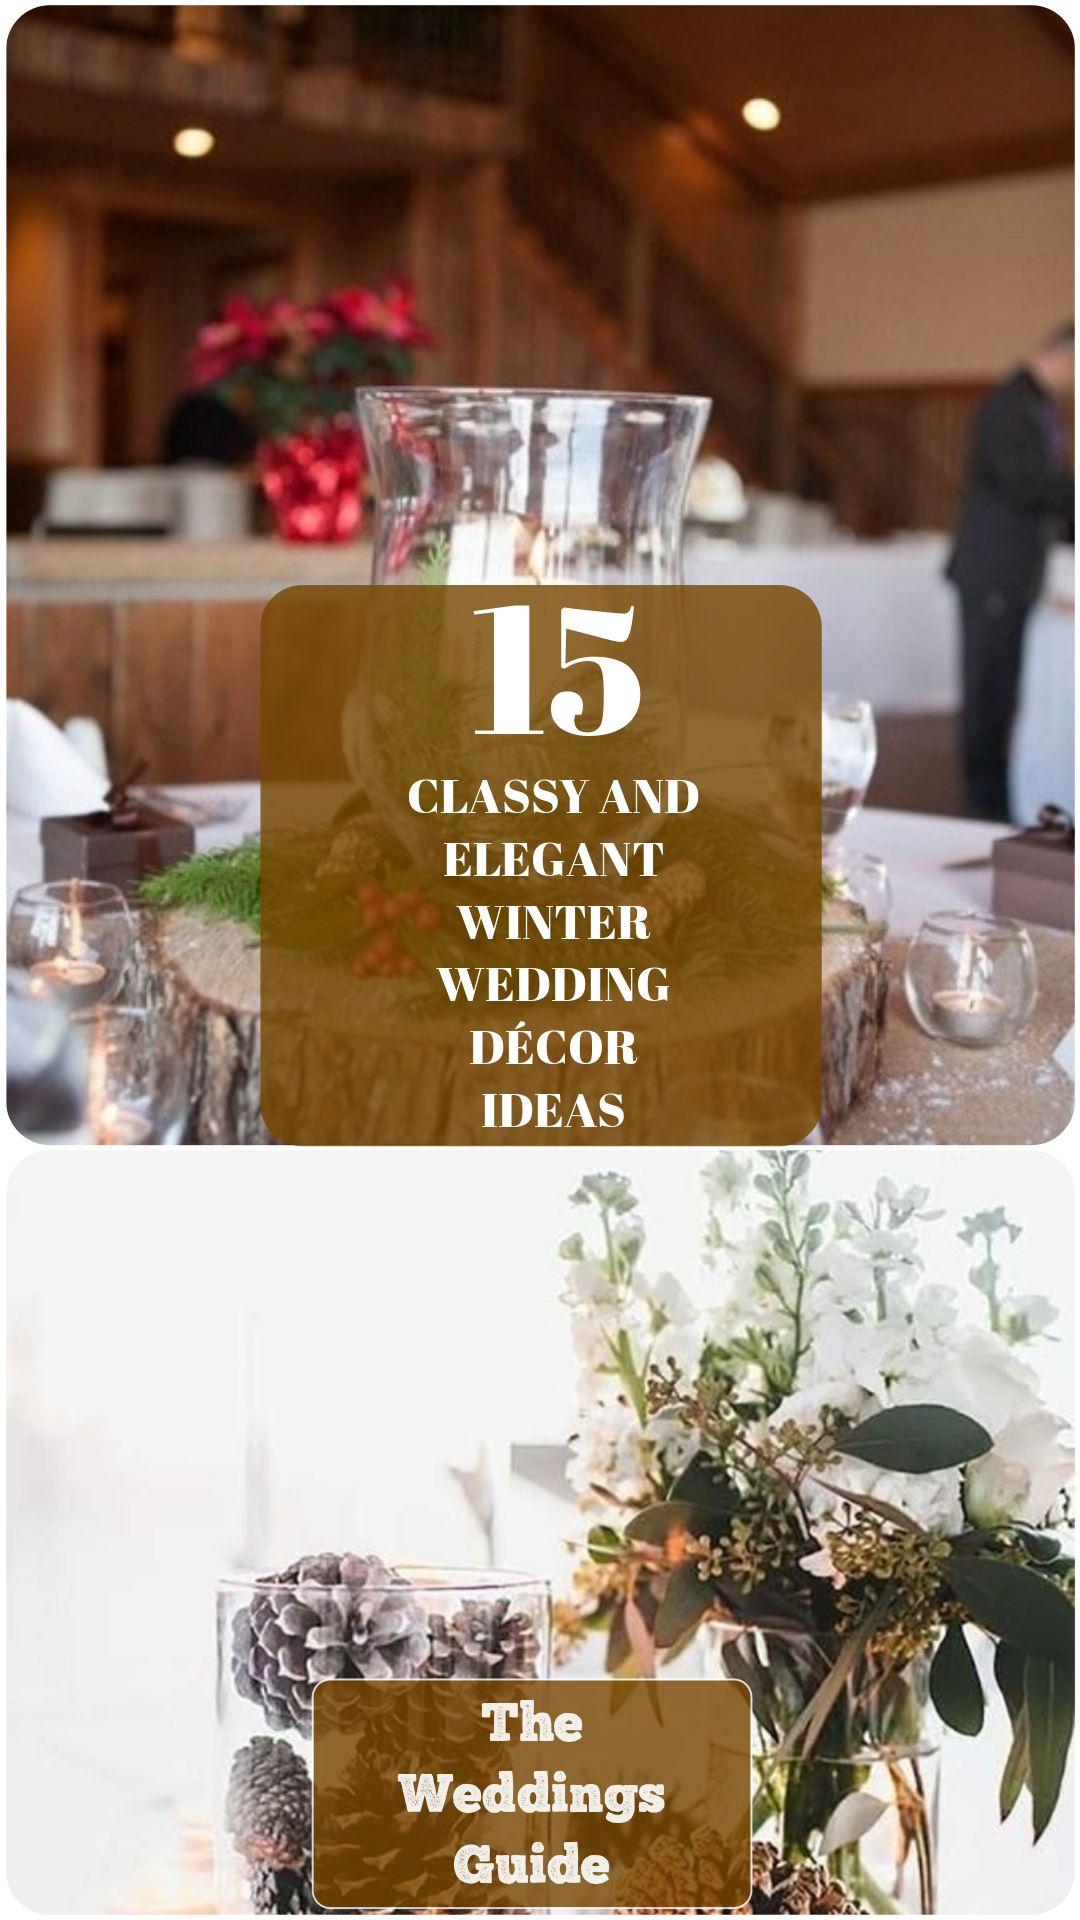 Winter Wedding Decor Ideas #weddingdecor